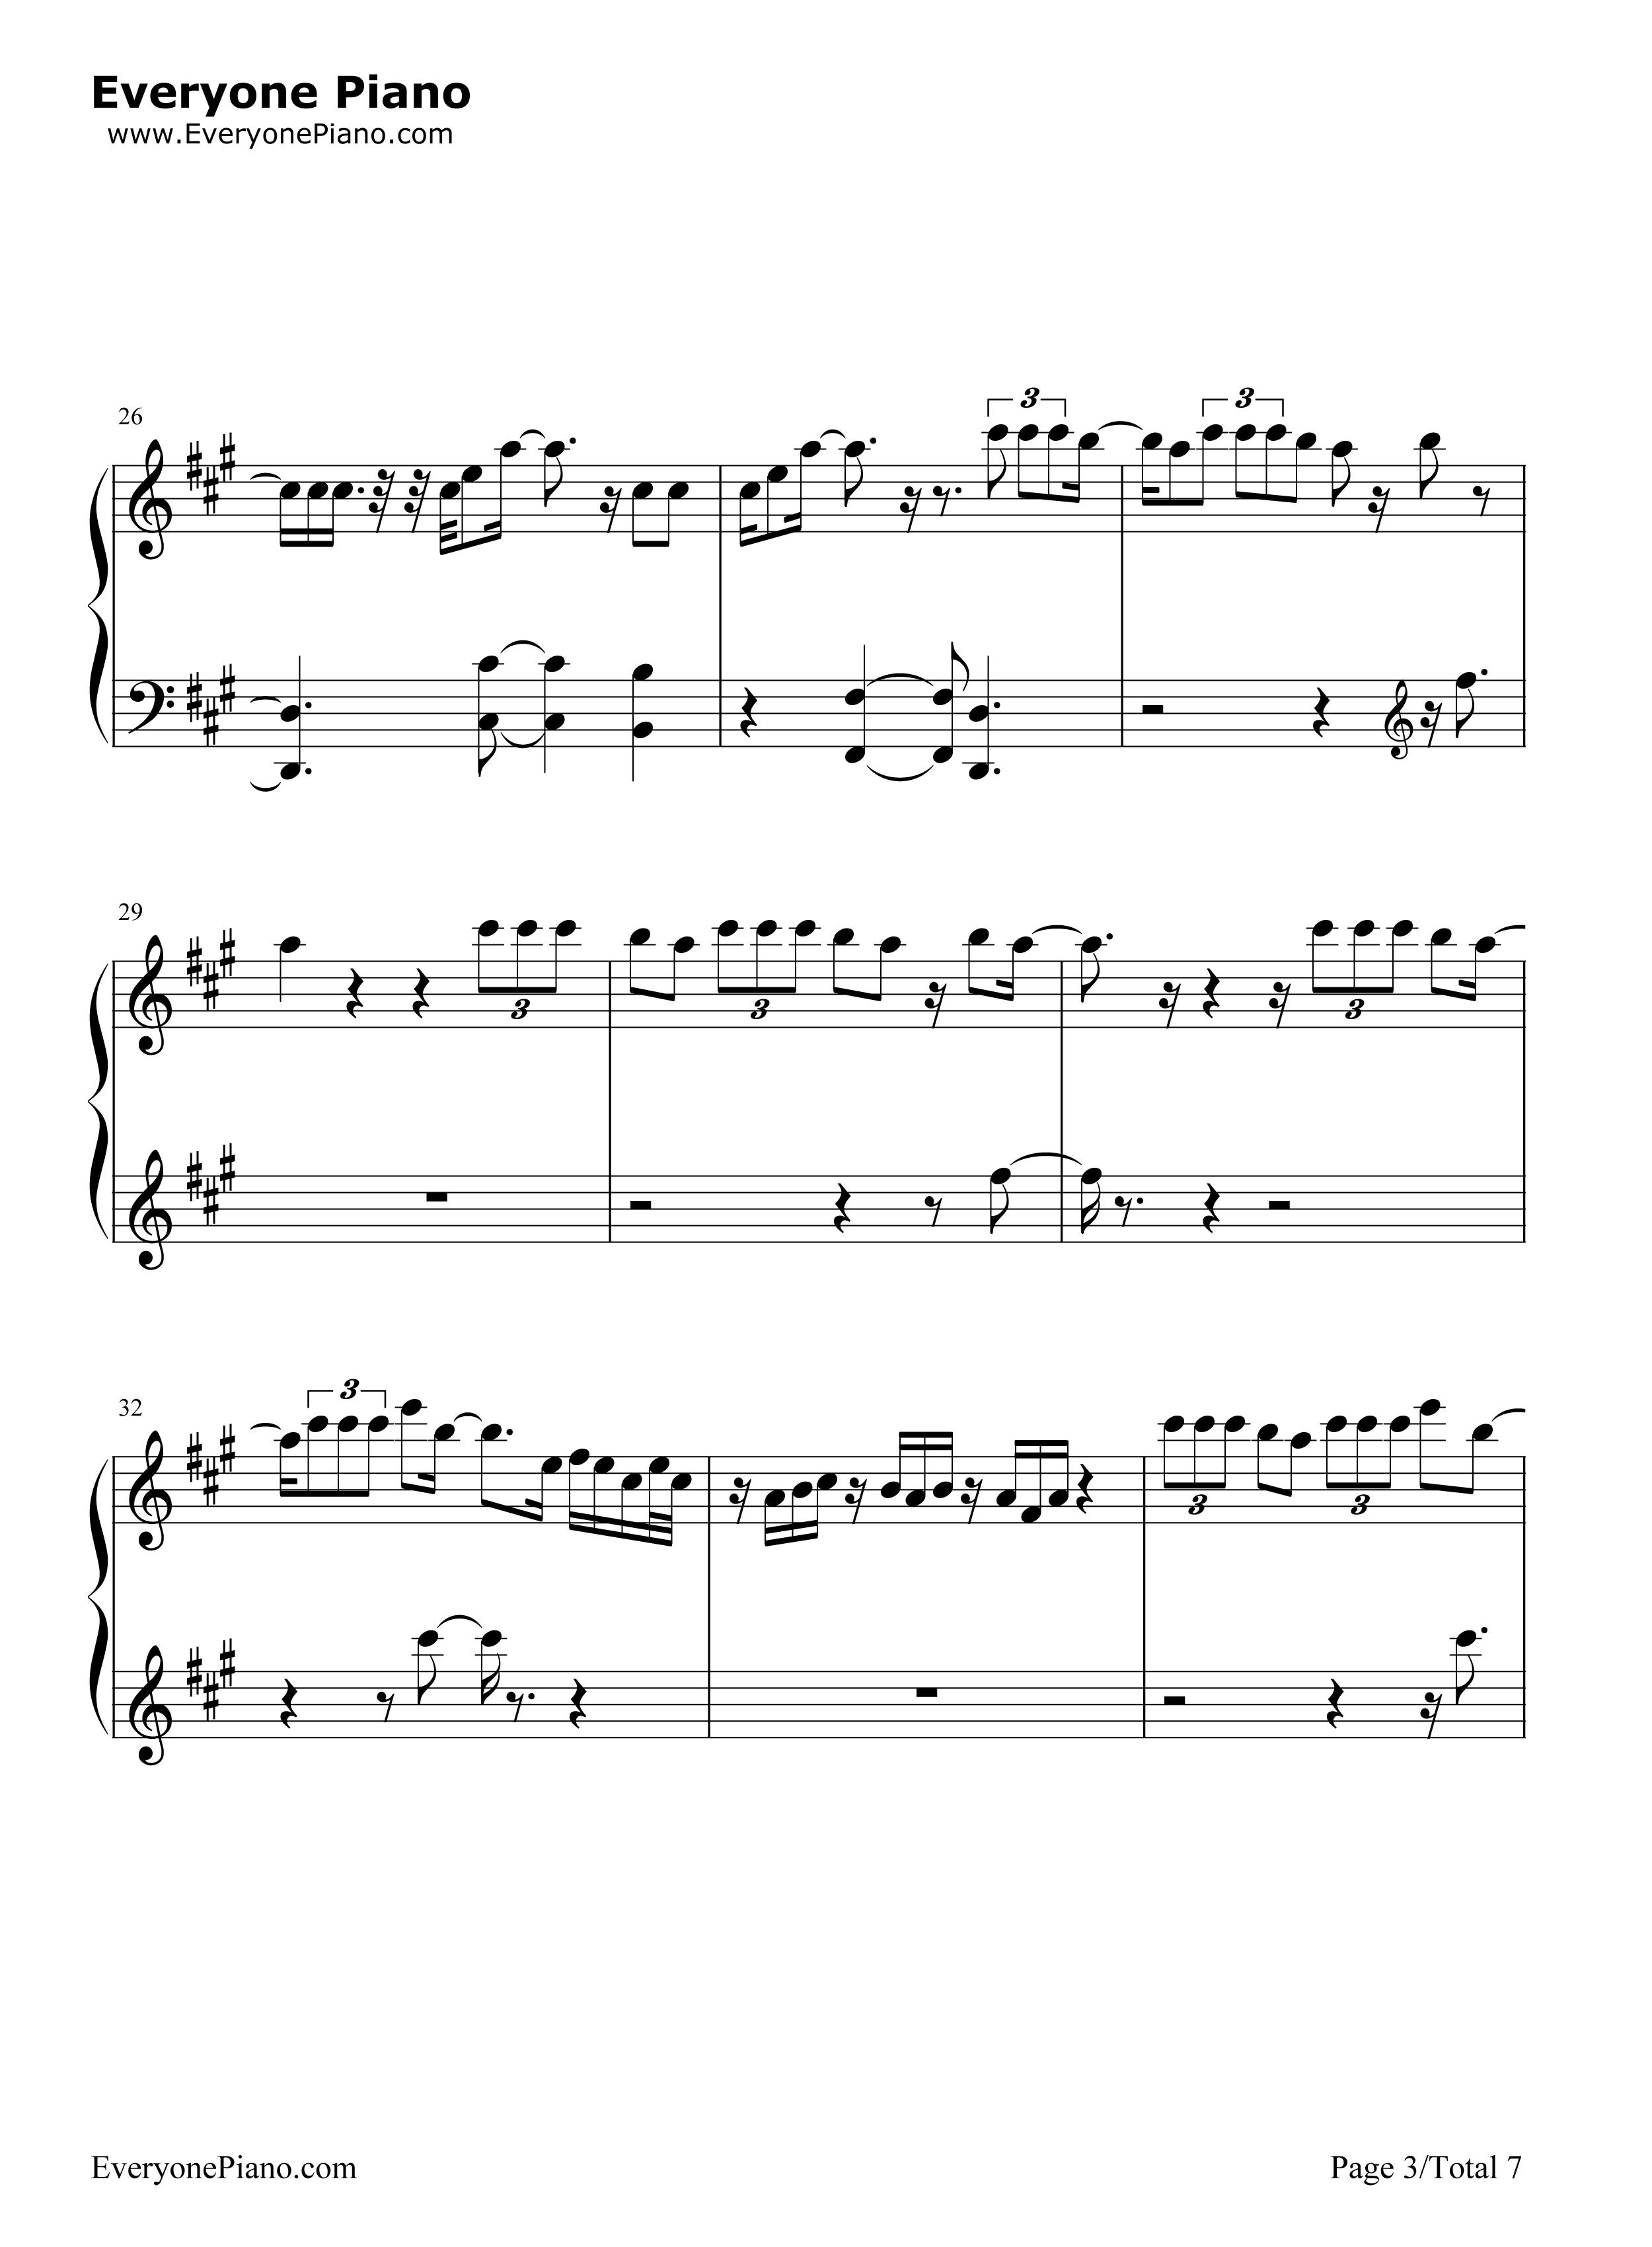 Most Girls Hailee Steinfeld五线谱预览3 钢琴谱档 五线谱 双手简谱 数位